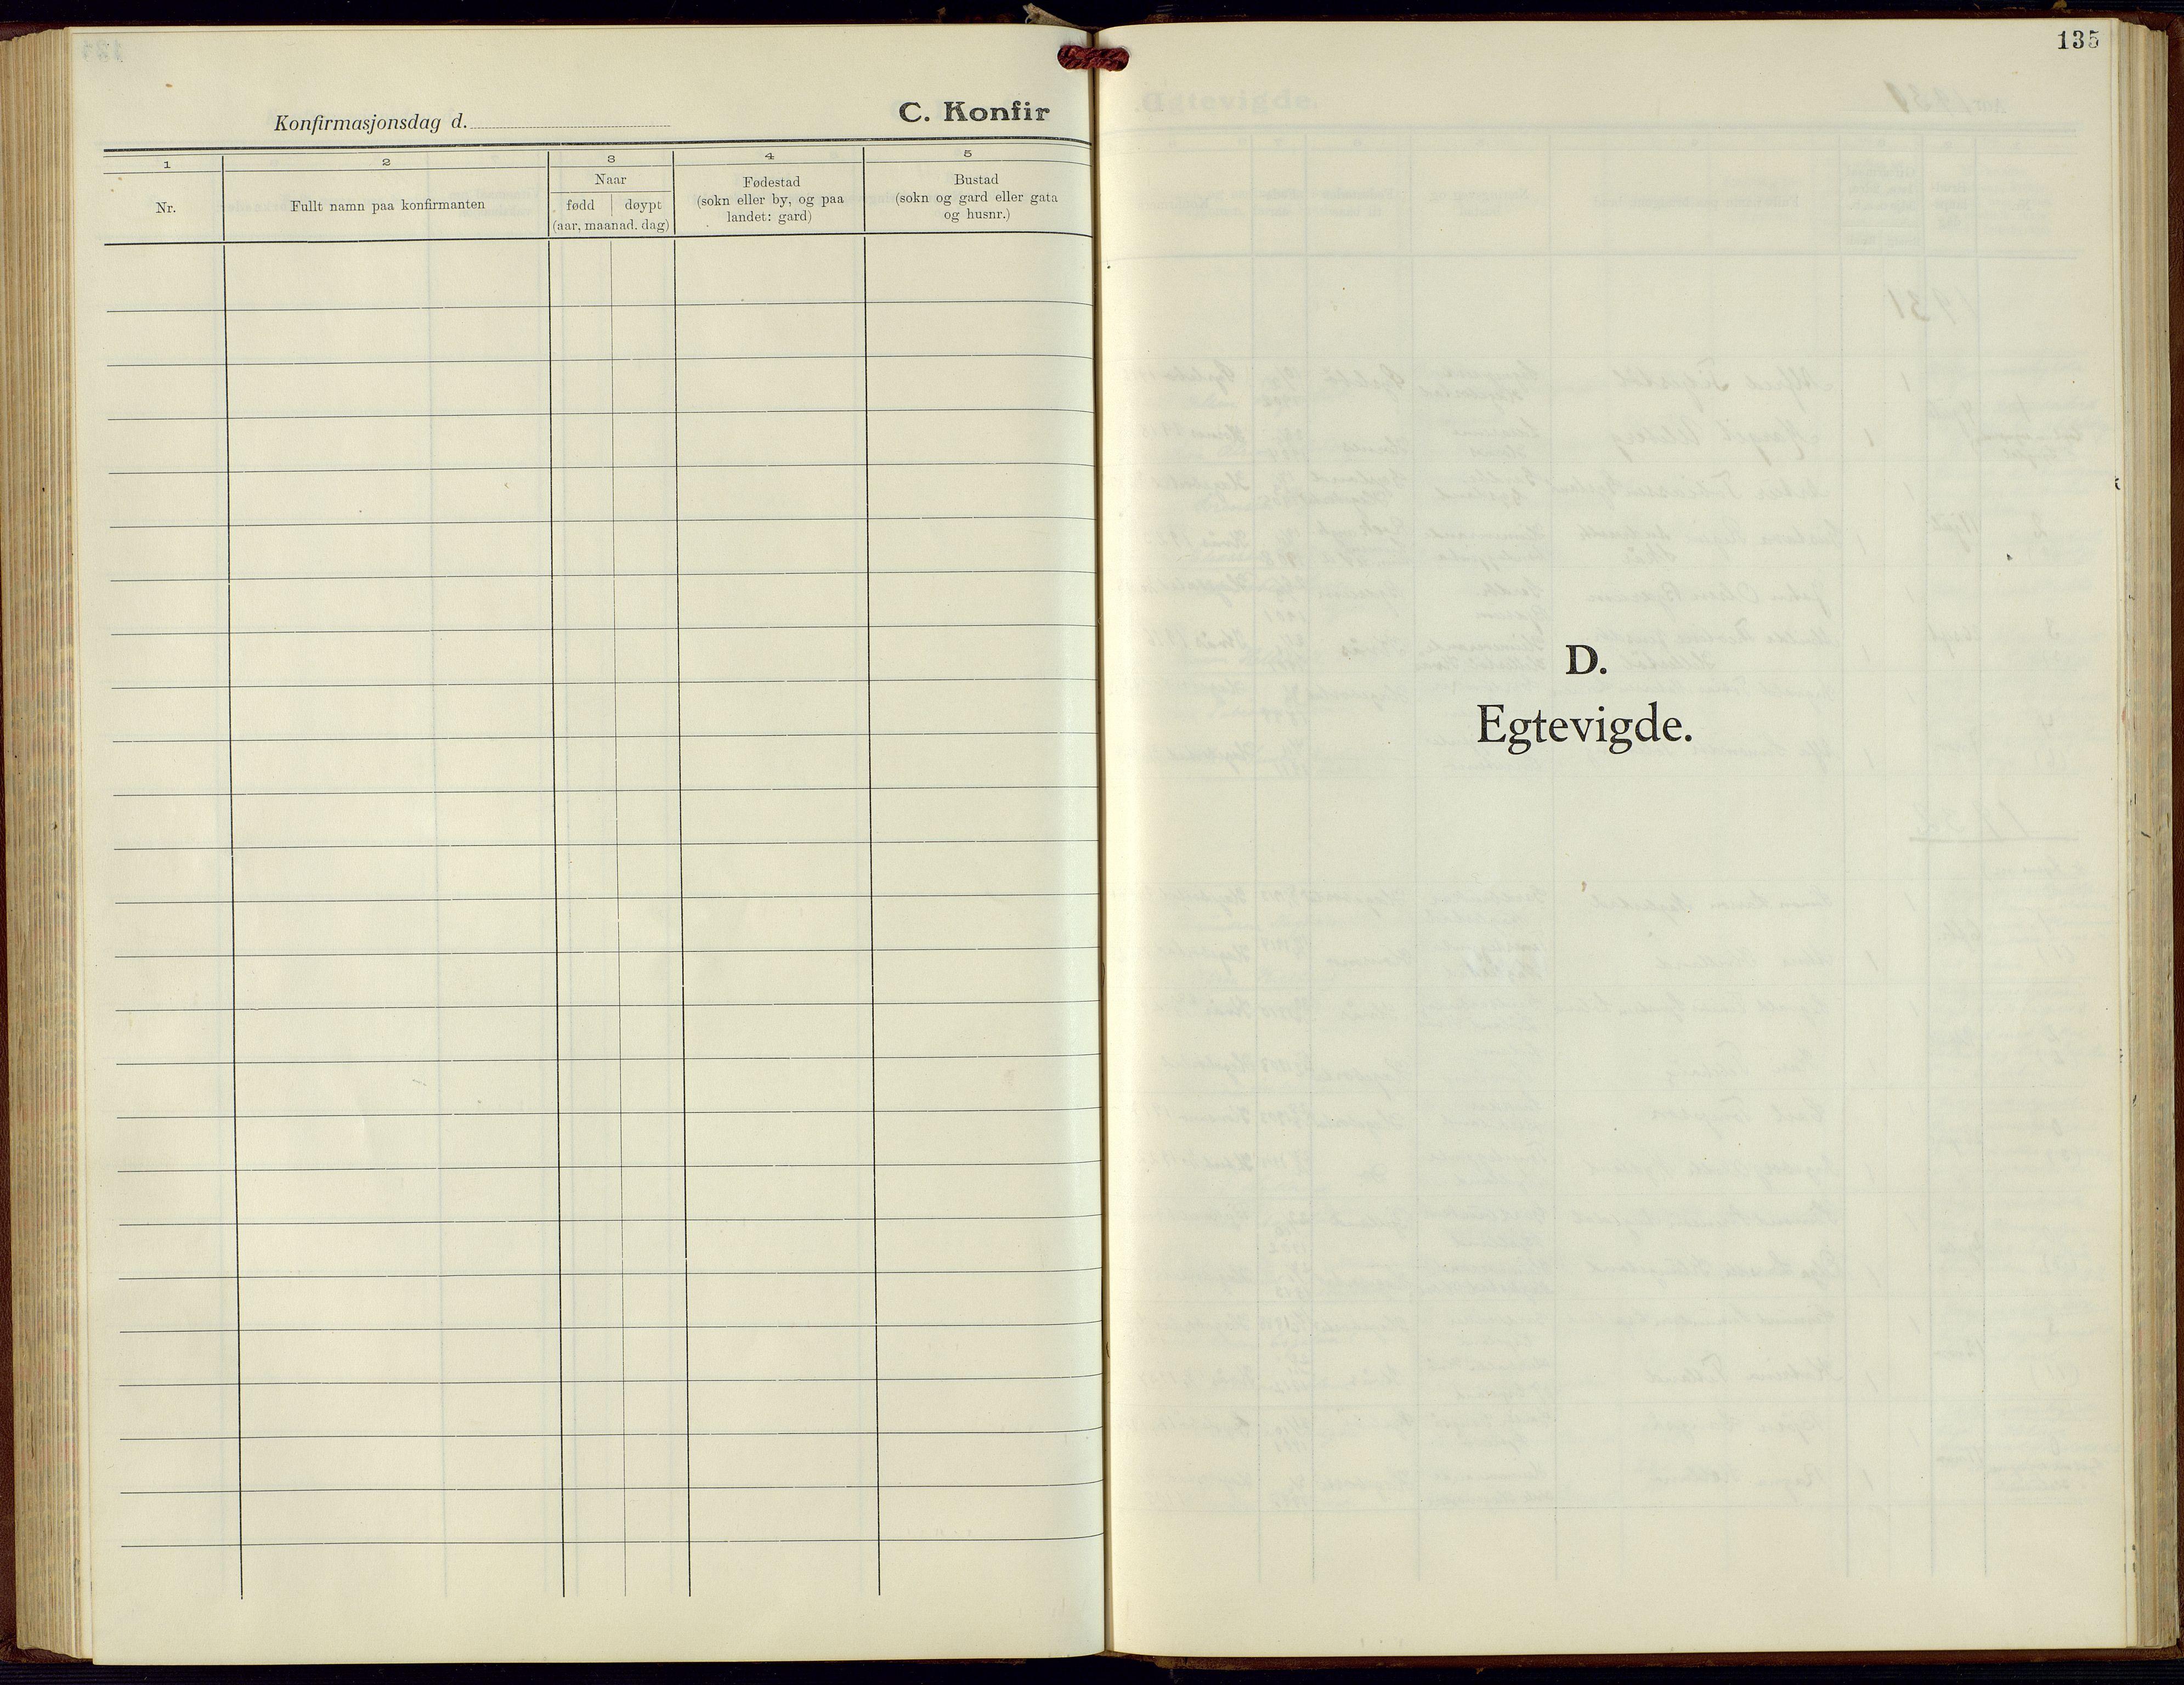 SAK, Hægebostad sokneprestkontor, F/Fb/Fba/L0006: Klokkerbok nr. B 6, 1931-1970, s. 135